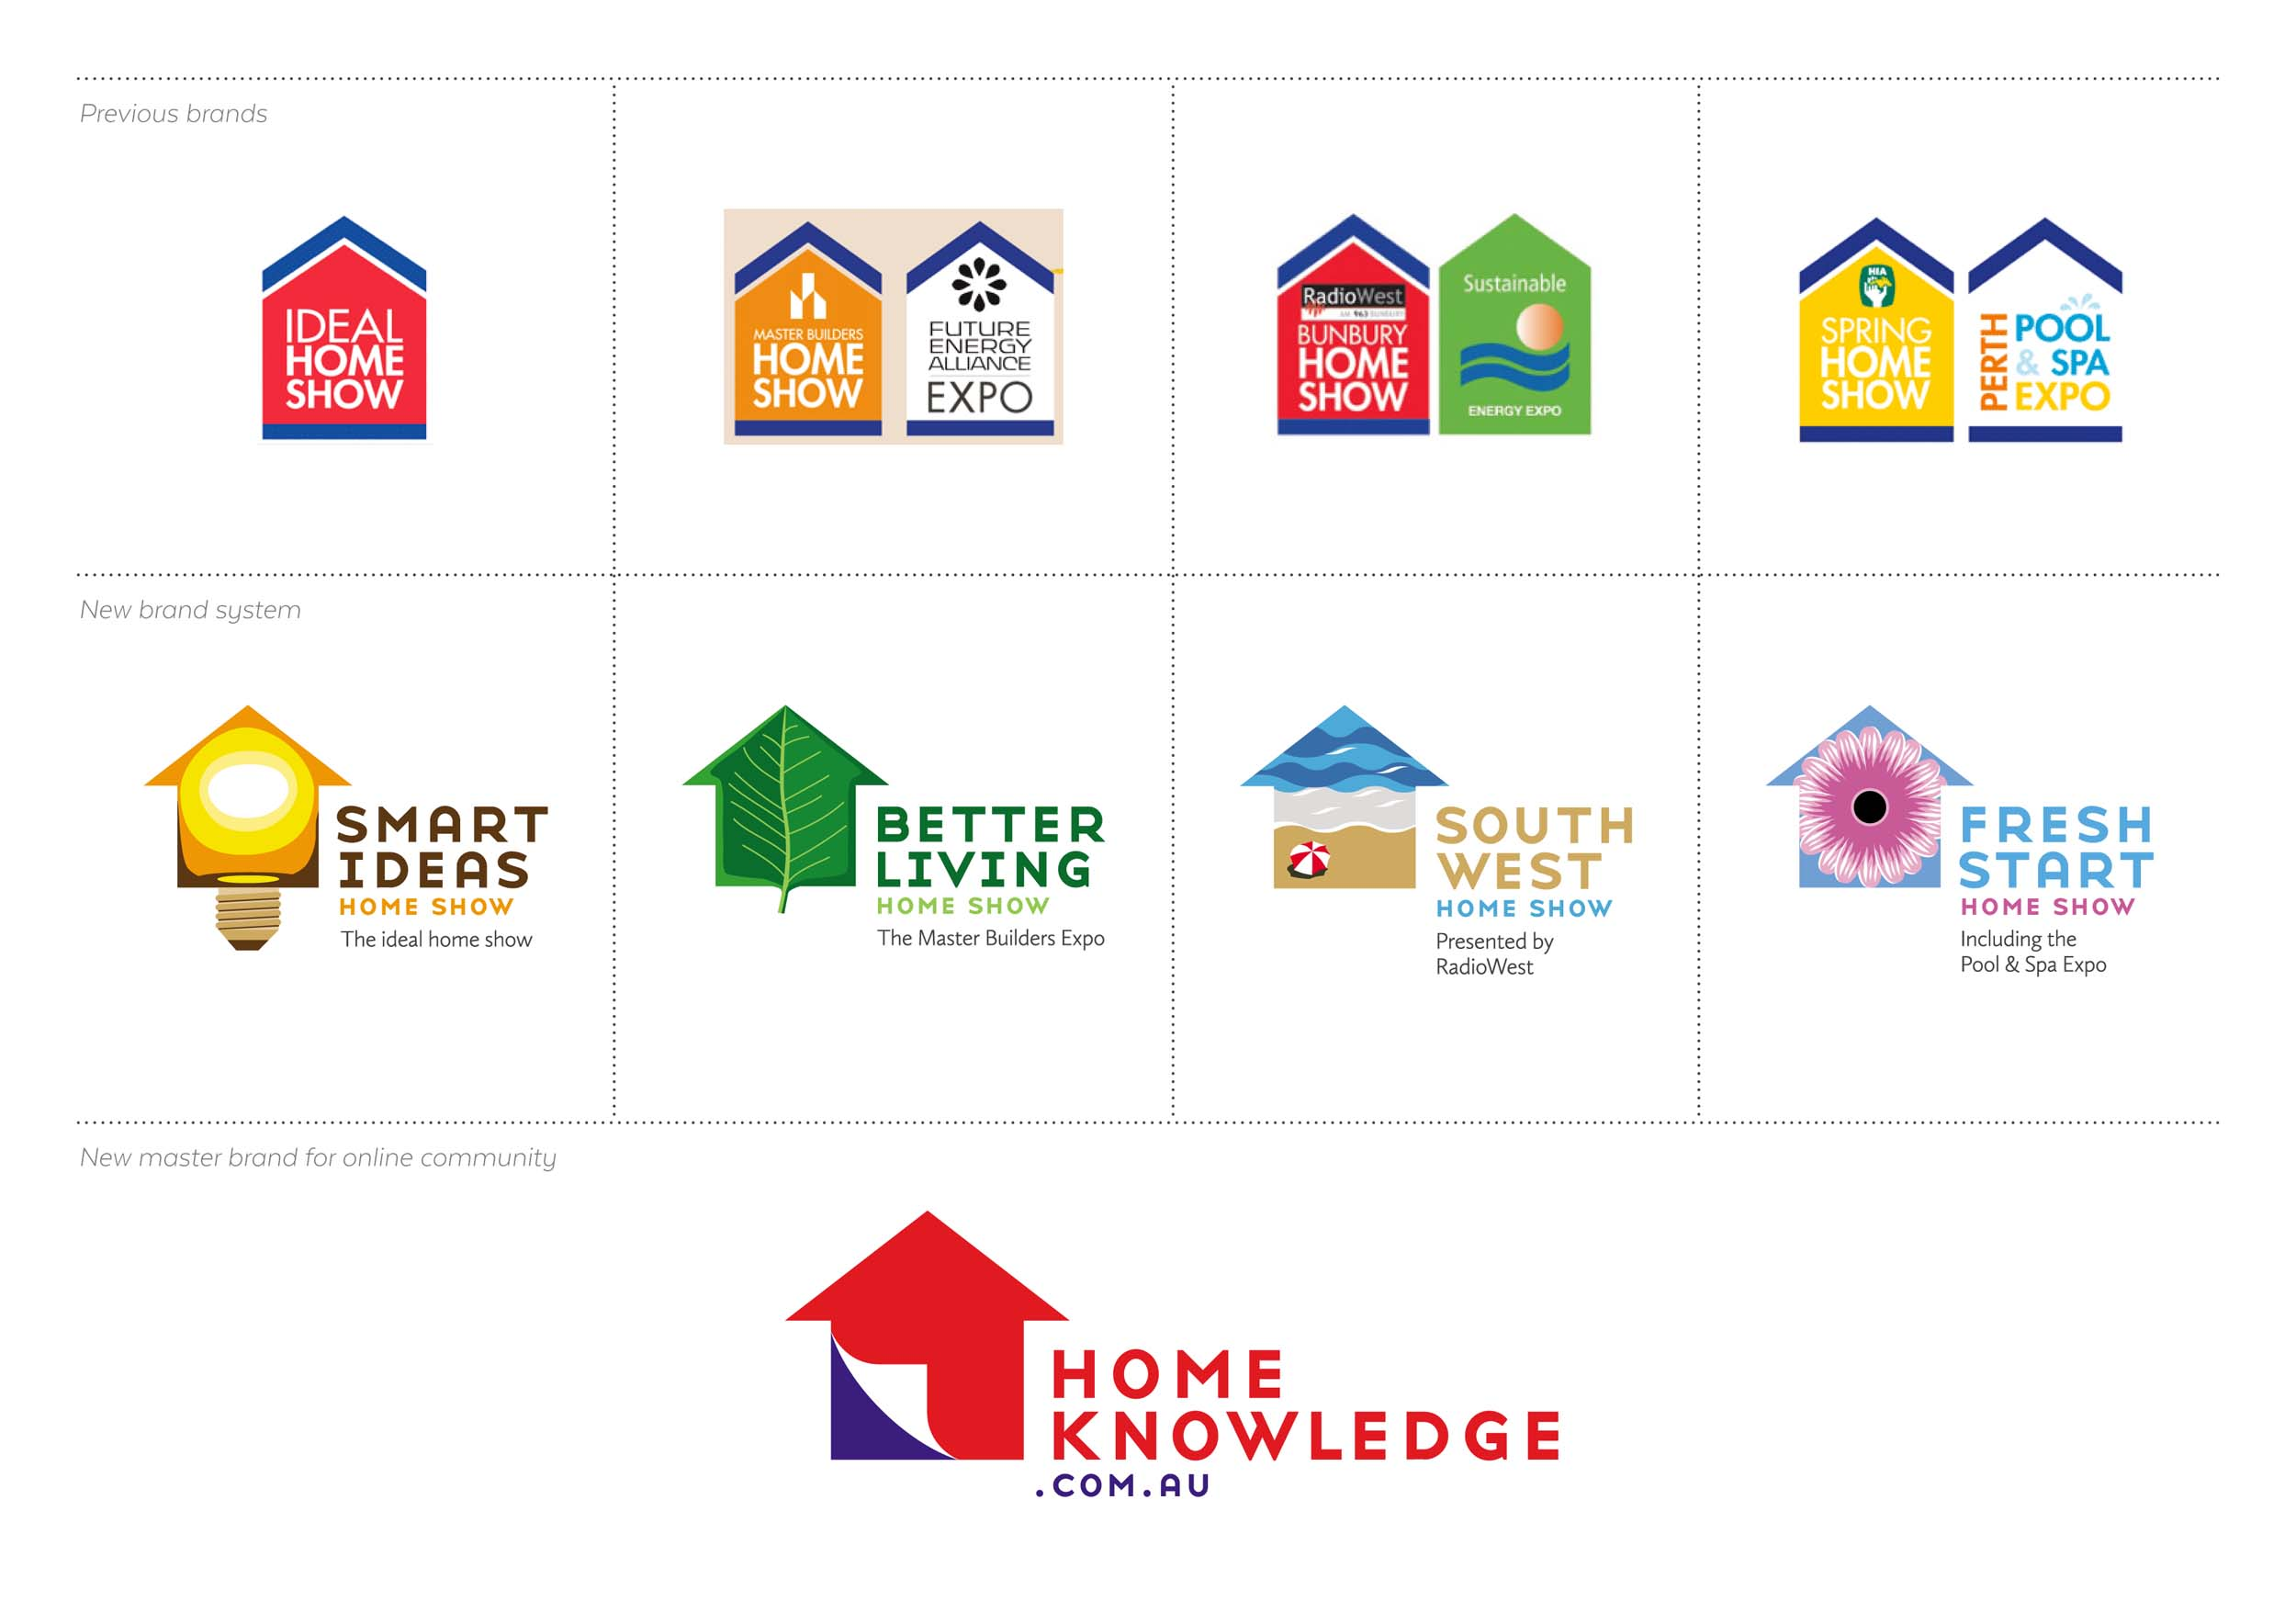 Brand_Home Shows.jpg